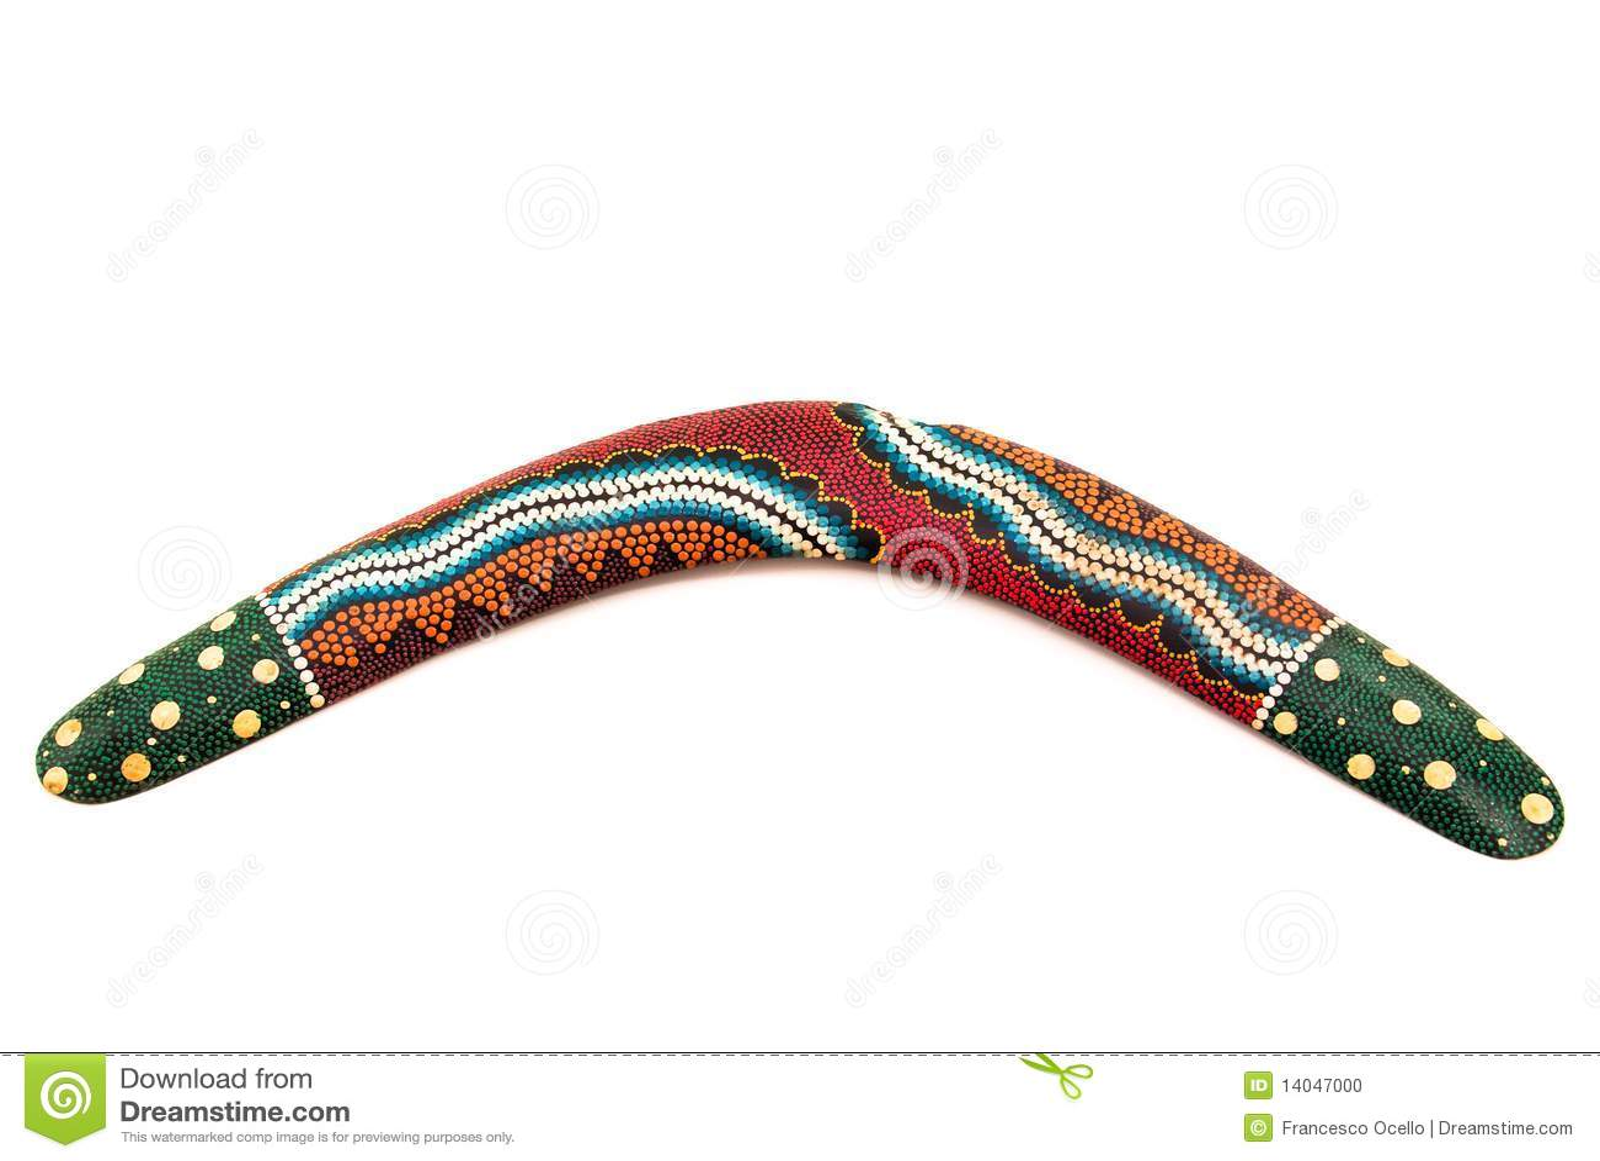 Australian boomerang stock photo image 14047000 for Australian boomerang template